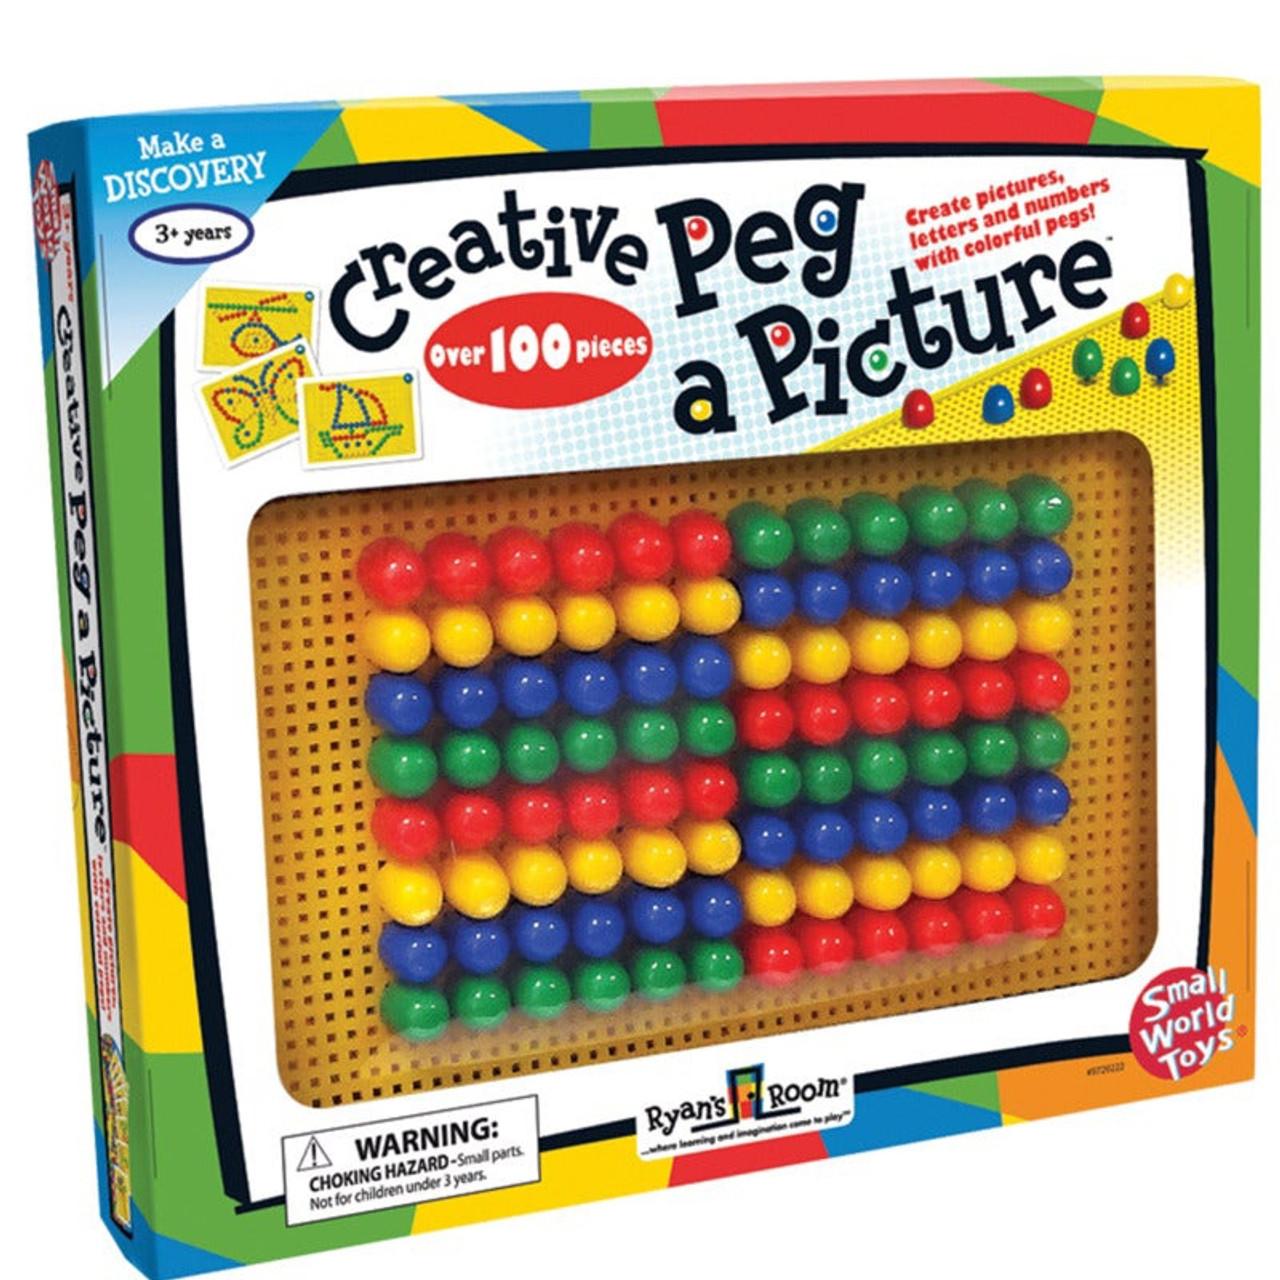 CREATIVE PEG A PICTURE